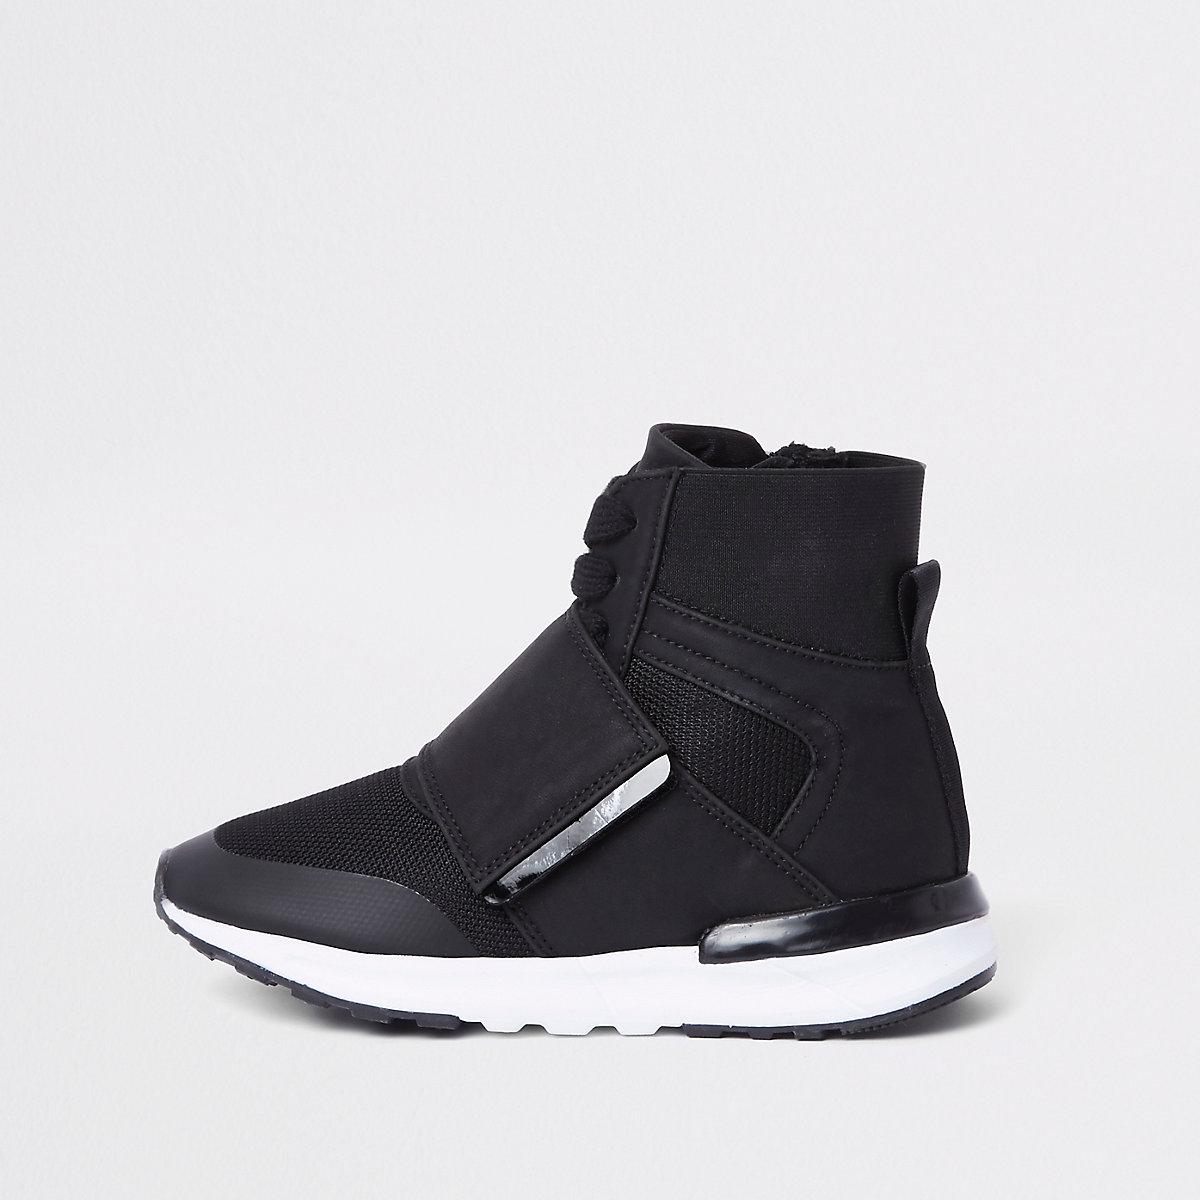 Kids black high top sports sneakers